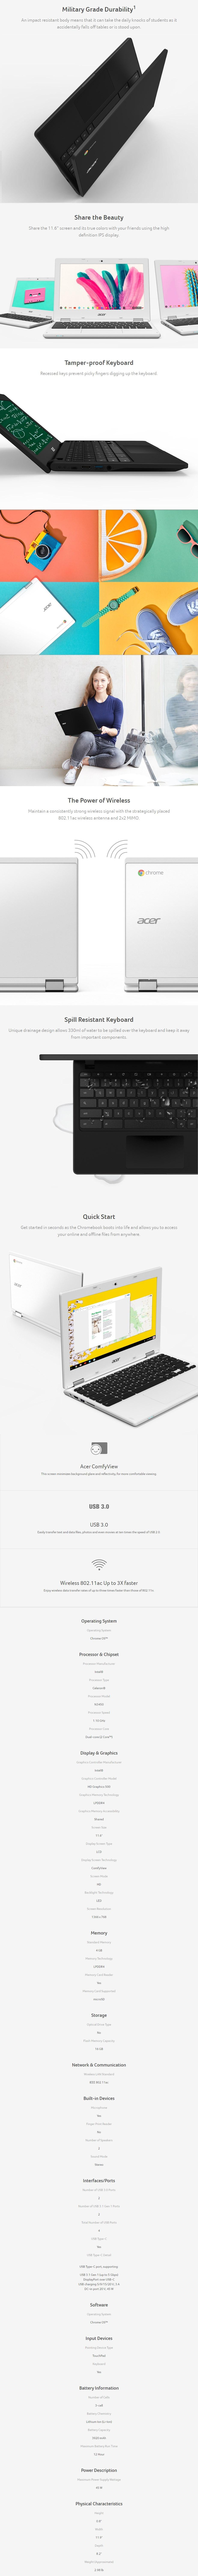 "ACER Chromebook 11.6"" HD Celeron N3450 4GB 16GB ChromeOS - Black - Overview 1"